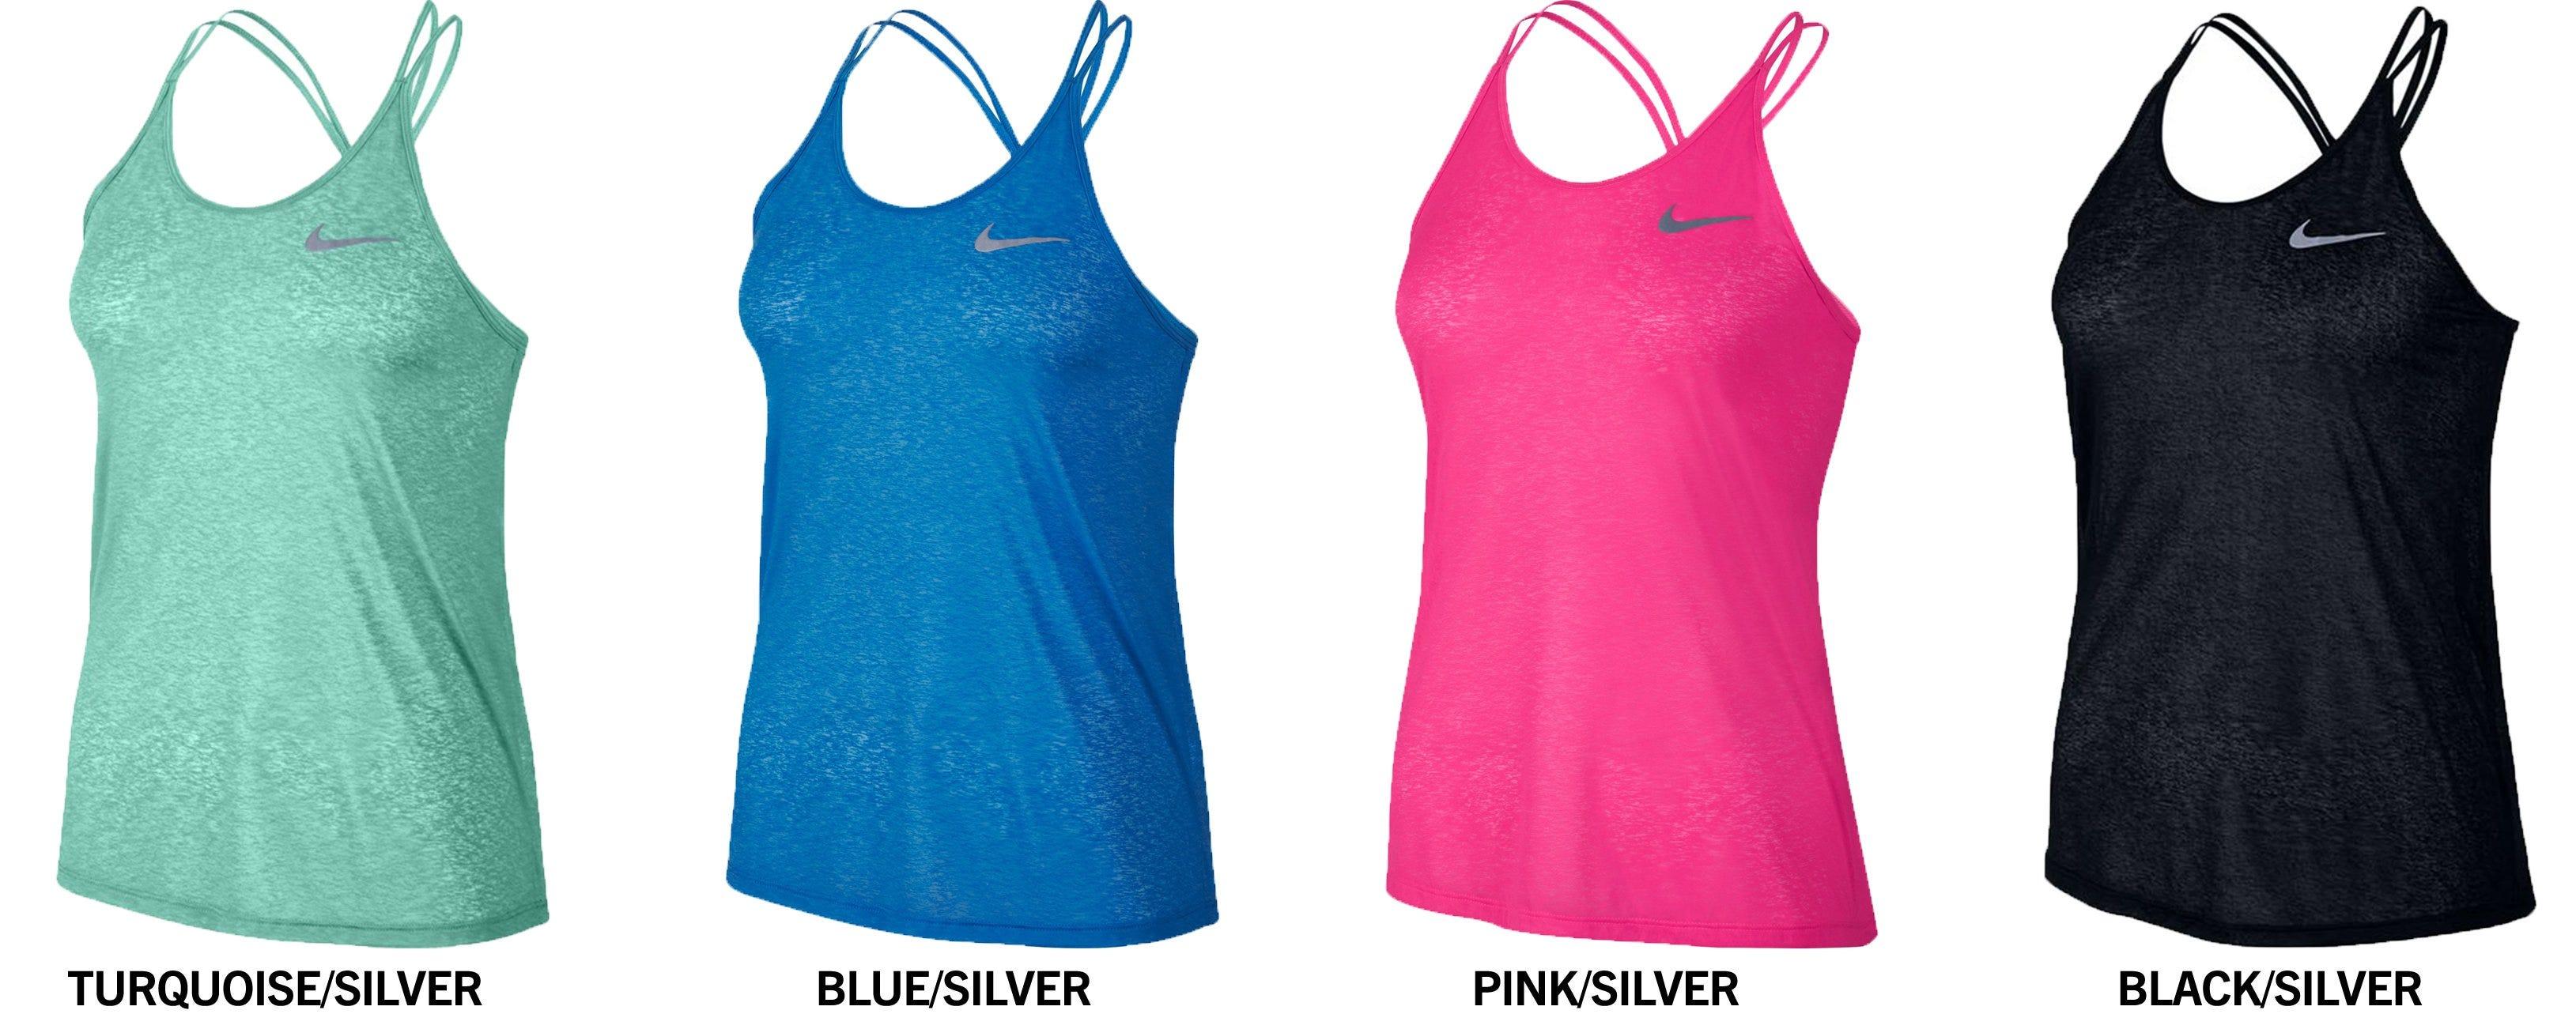 bbeb5e013ba9 ... Nike Dri-FIT Cool Breeze Women s Running Tank Top ...